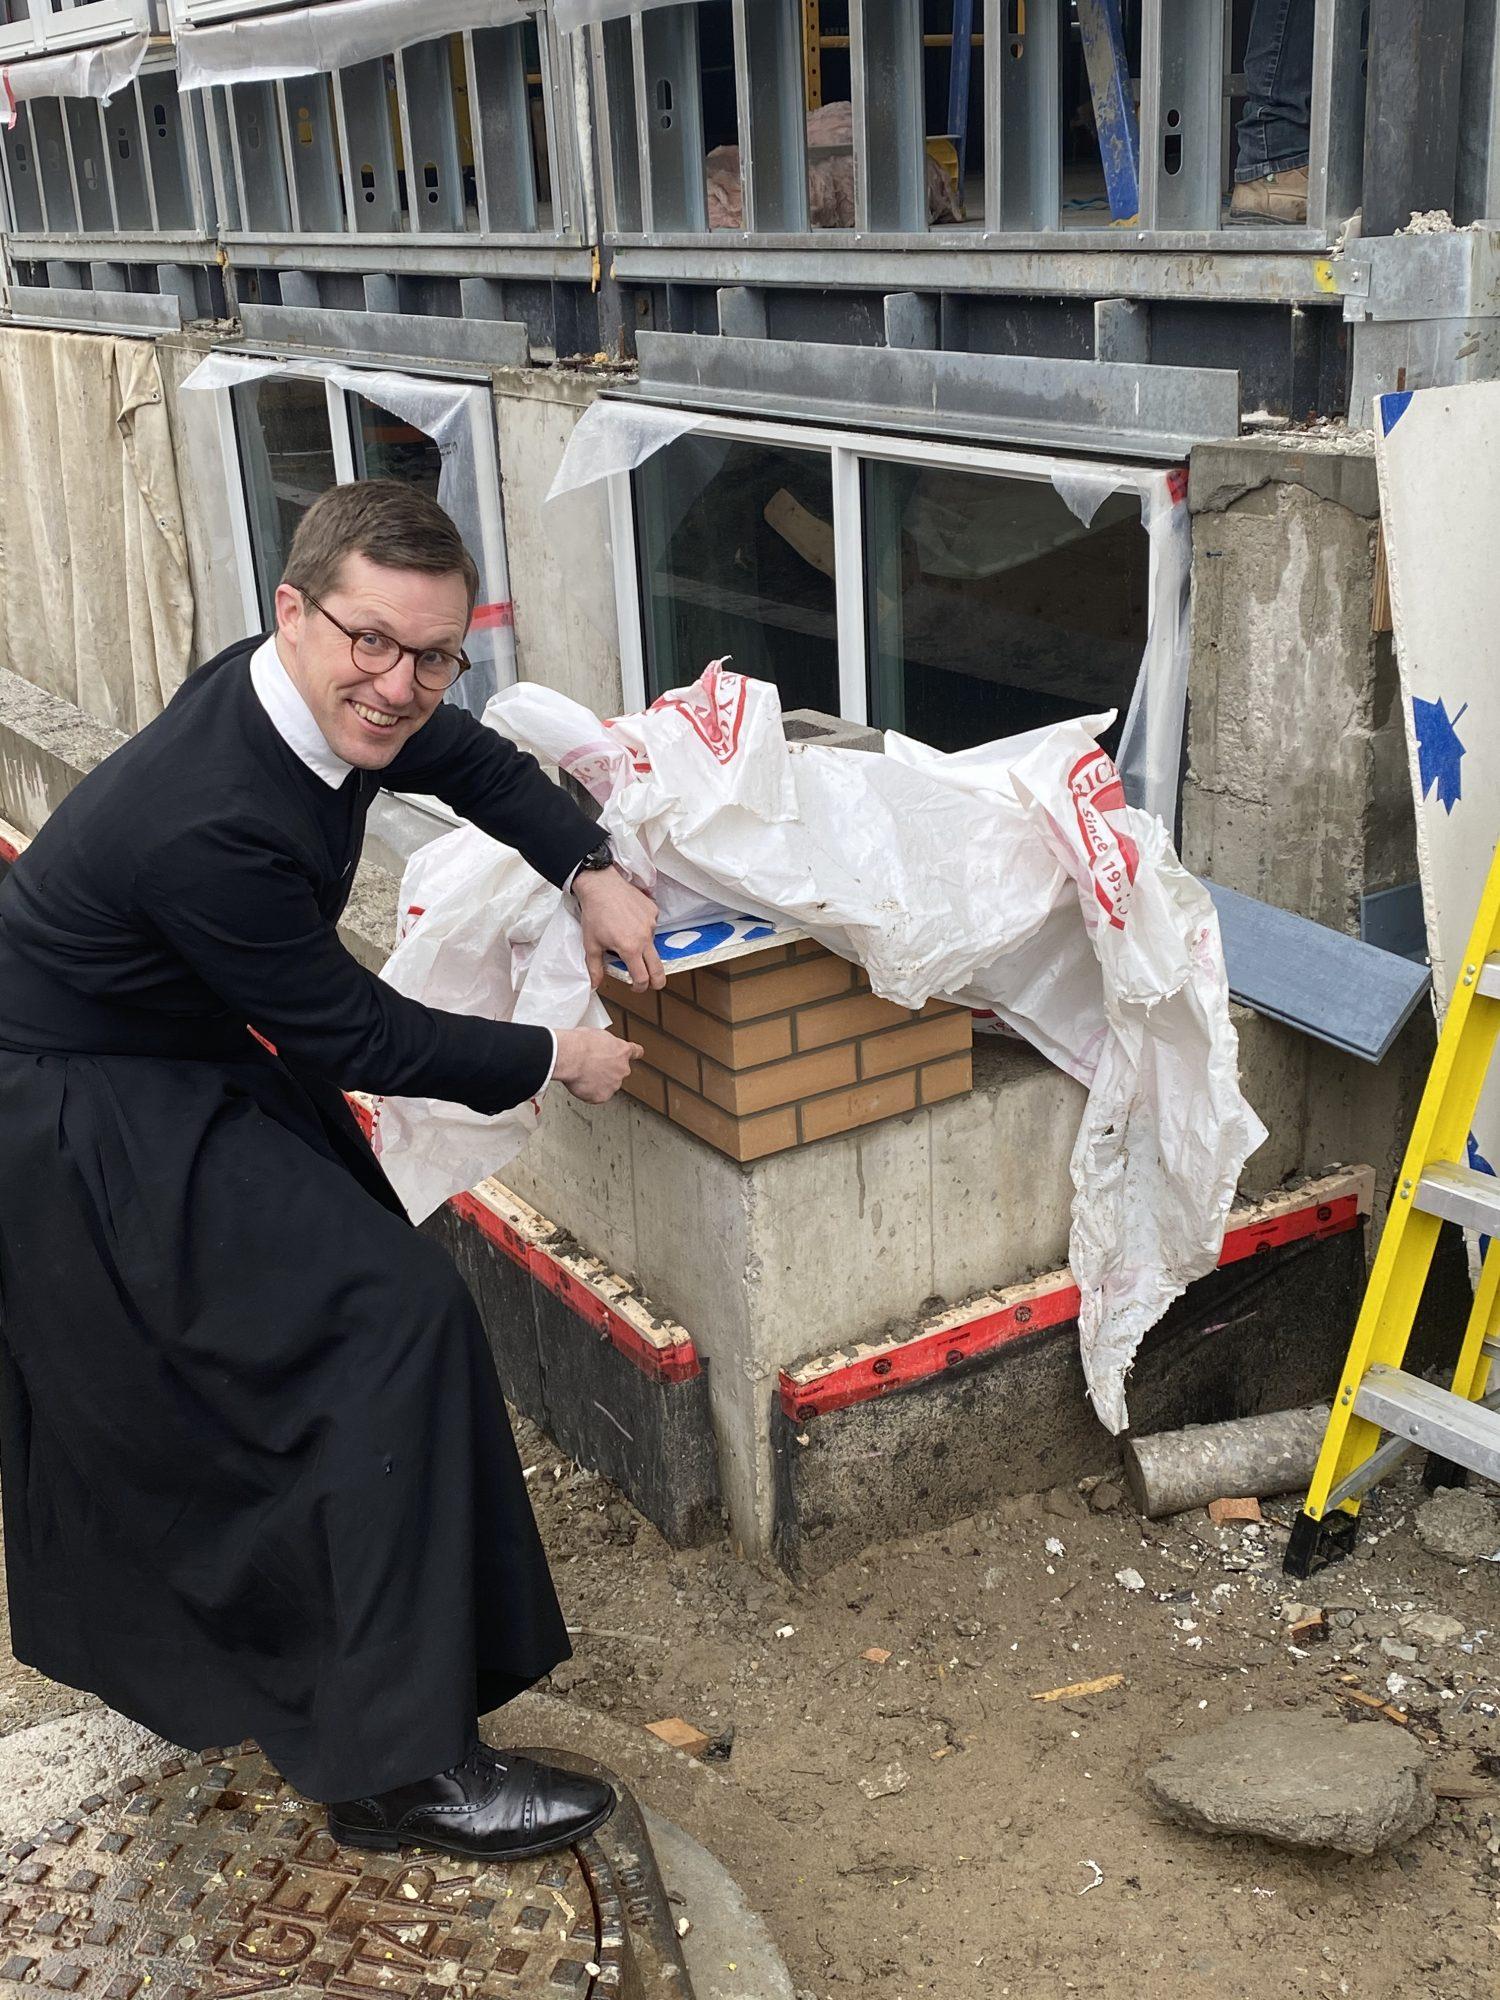 Fr Michael inspects the model bricks